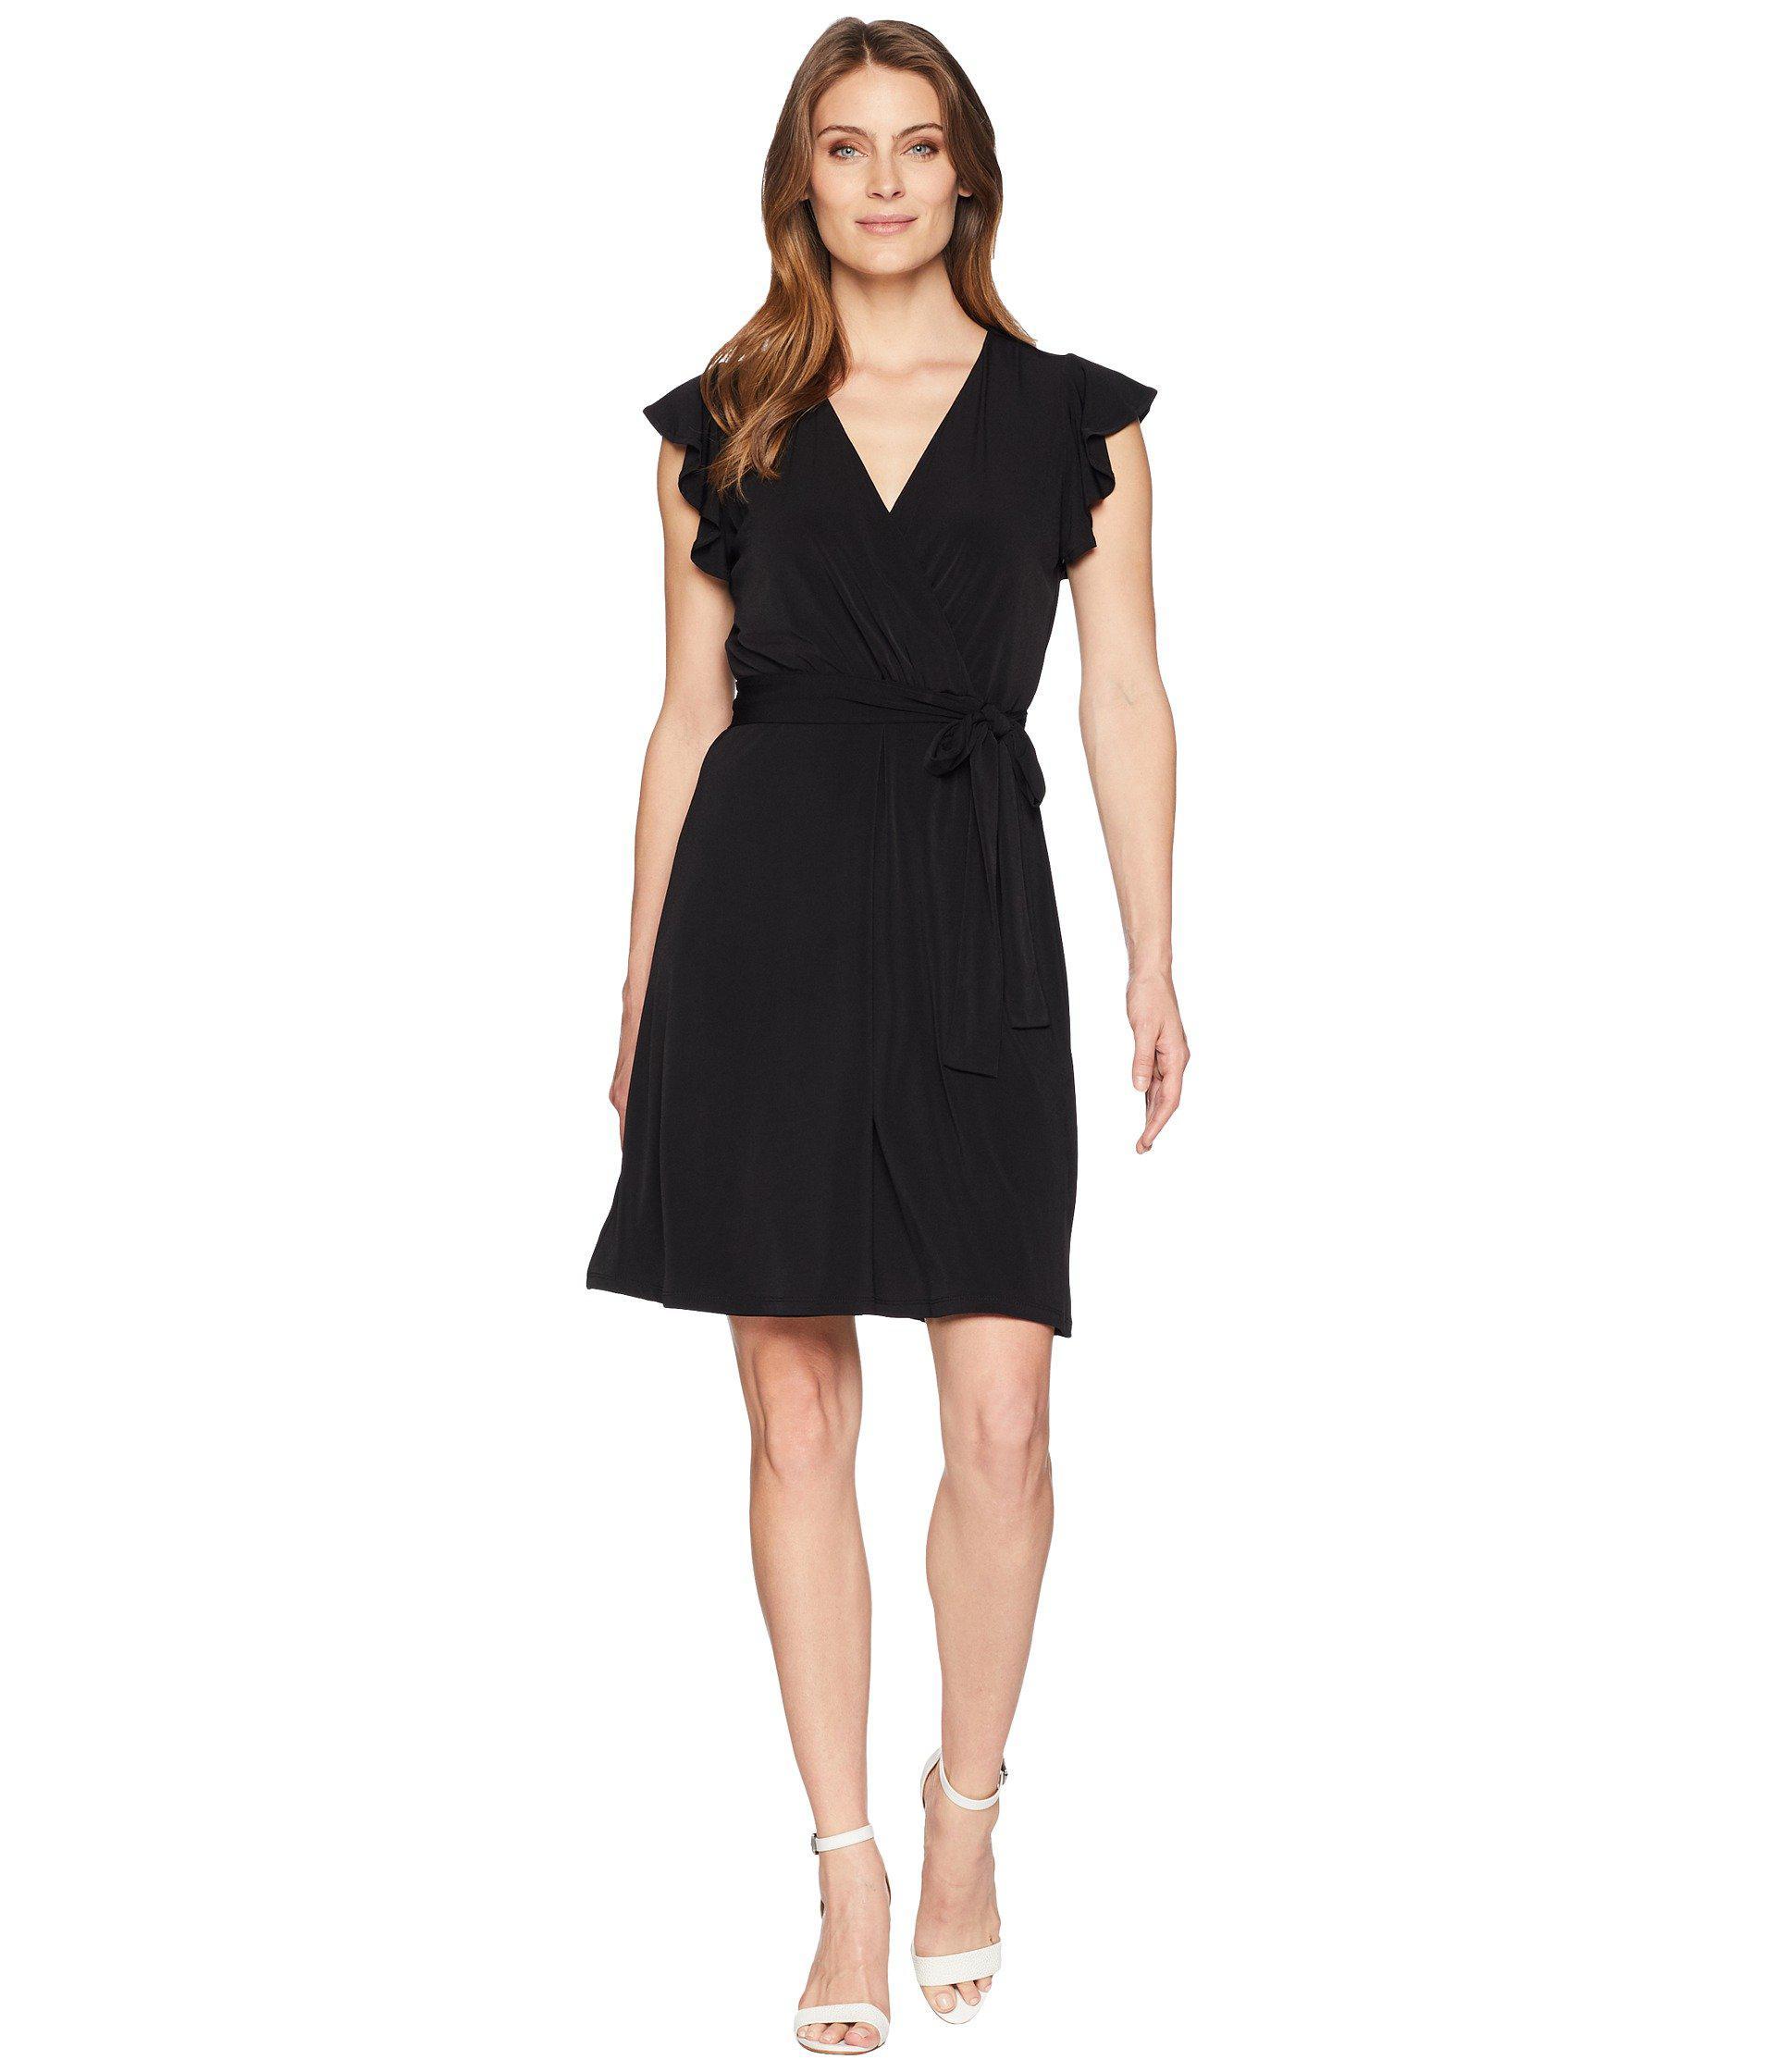 7aecade7fd00 Lyst - Ivanka Trump Flutter Short Sleeve Wrap Dress in Black - Save 66%